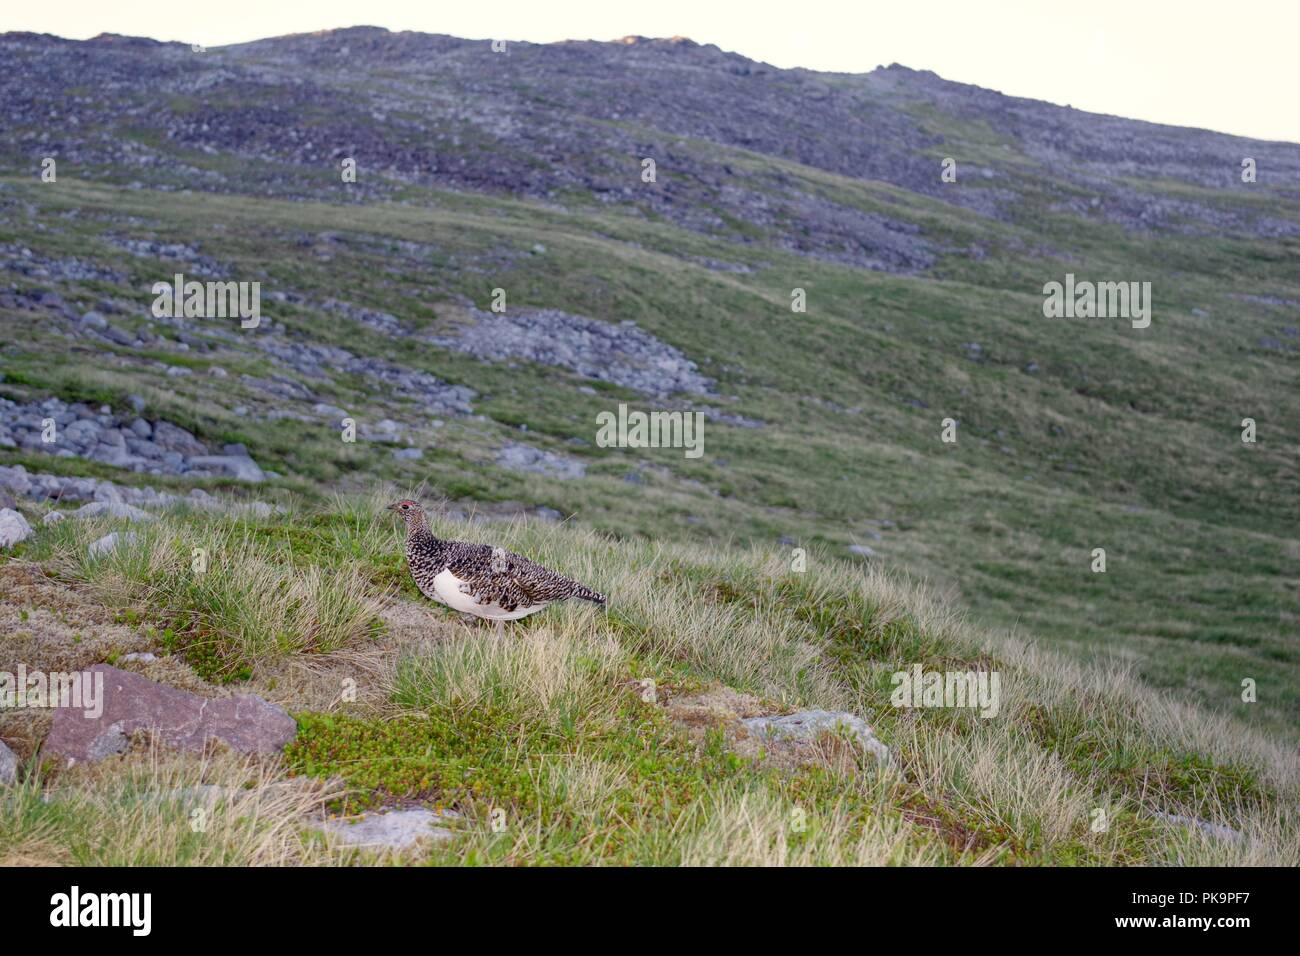 Female Ptarmigan (Lagopus muta) on Meall a'Ghiubhais Mountain. Beinn Eighe, Kinlochewe, Torridon, Scotland, UK. June, 2018. Stock Photo